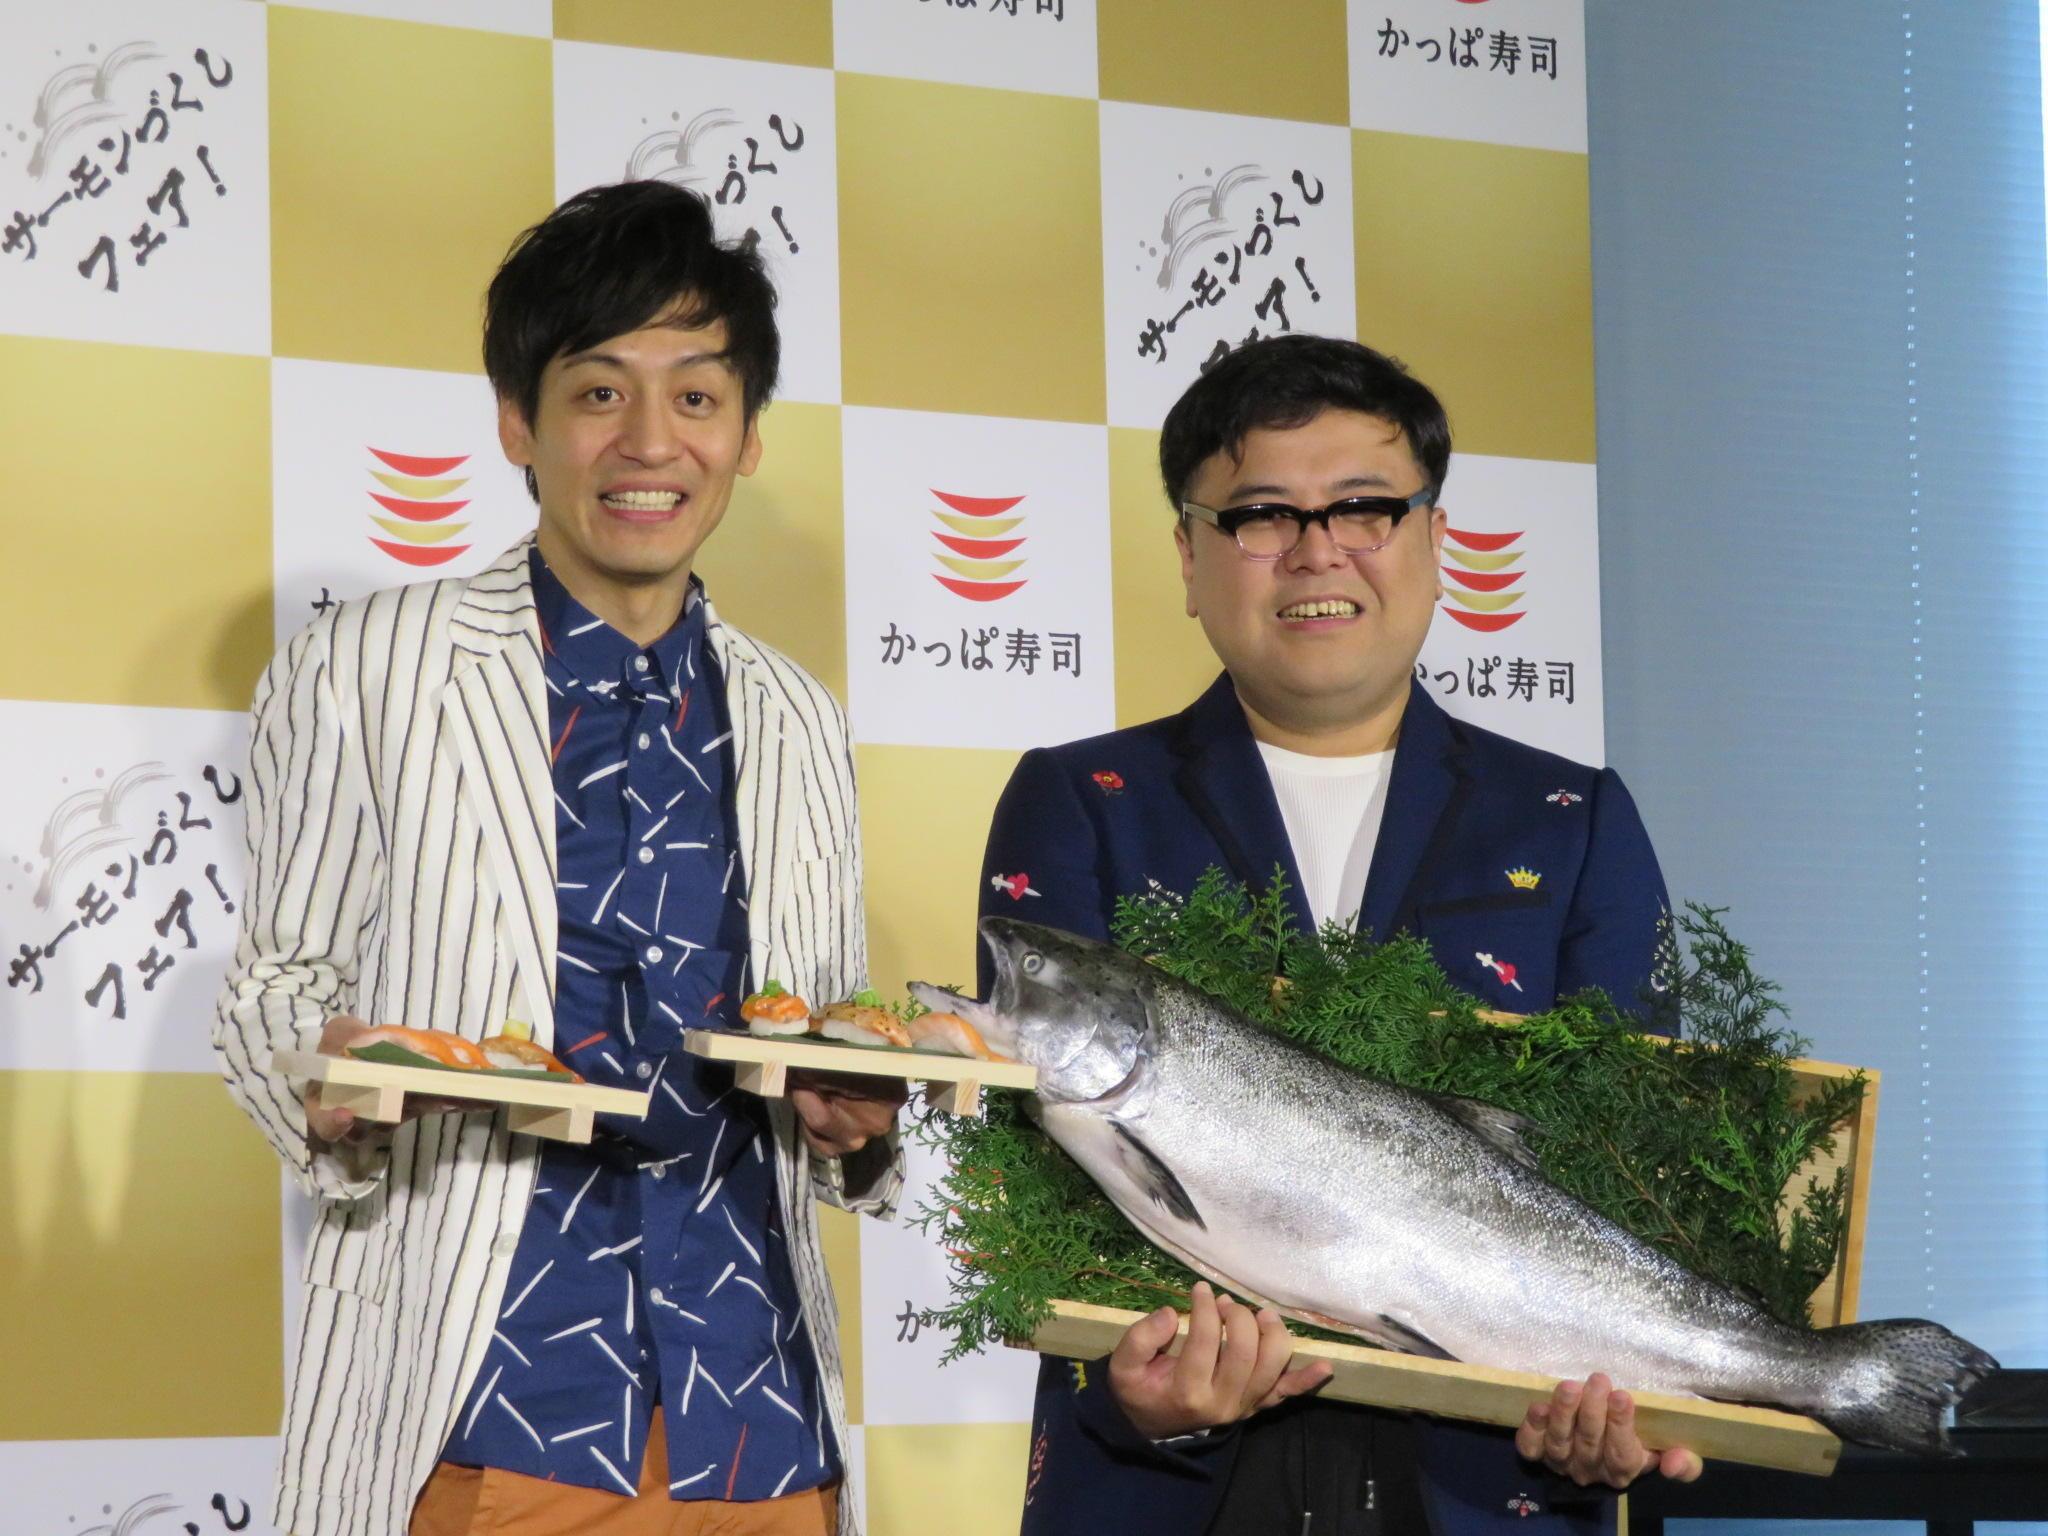 http://news.yoshimoto.co.jp/20180110175648-0d0d82b1aca656be67aef3a28f9abad1a72ceb87.jpg